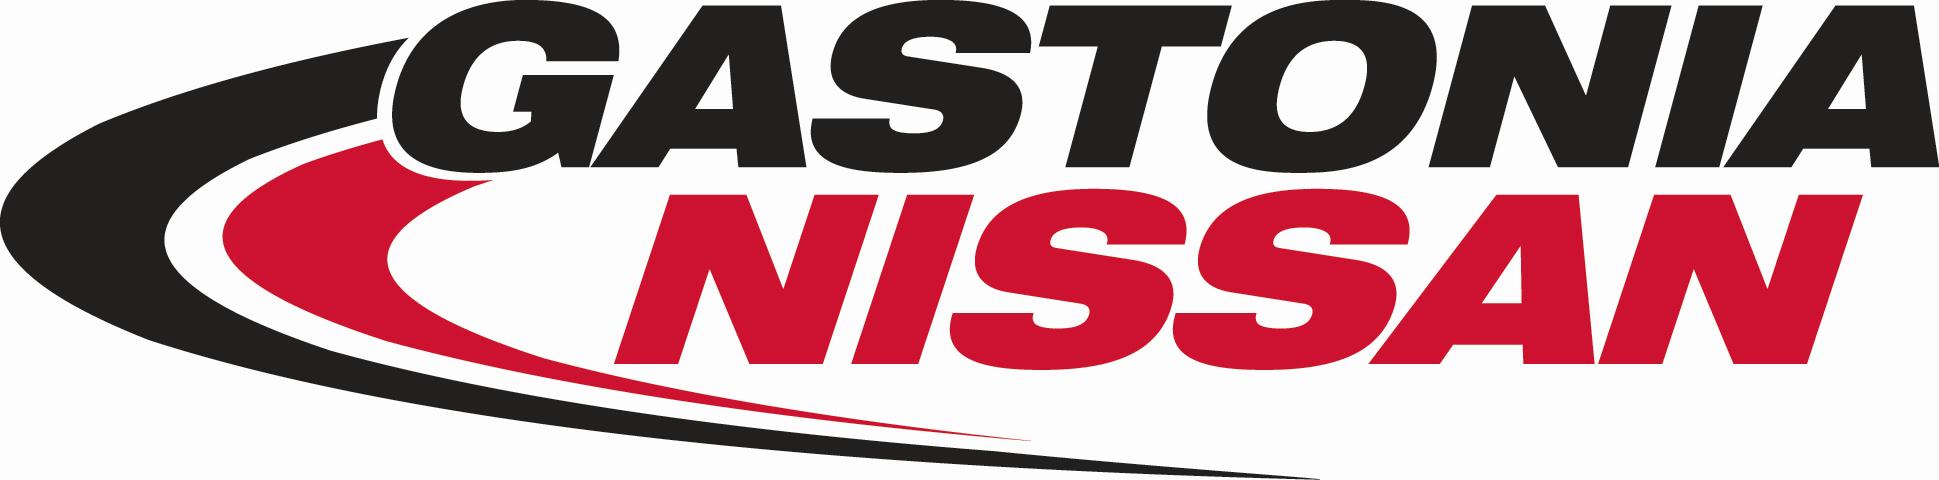 Nissan Of Gastonia >> Join Catherine At Gastonia Nissan